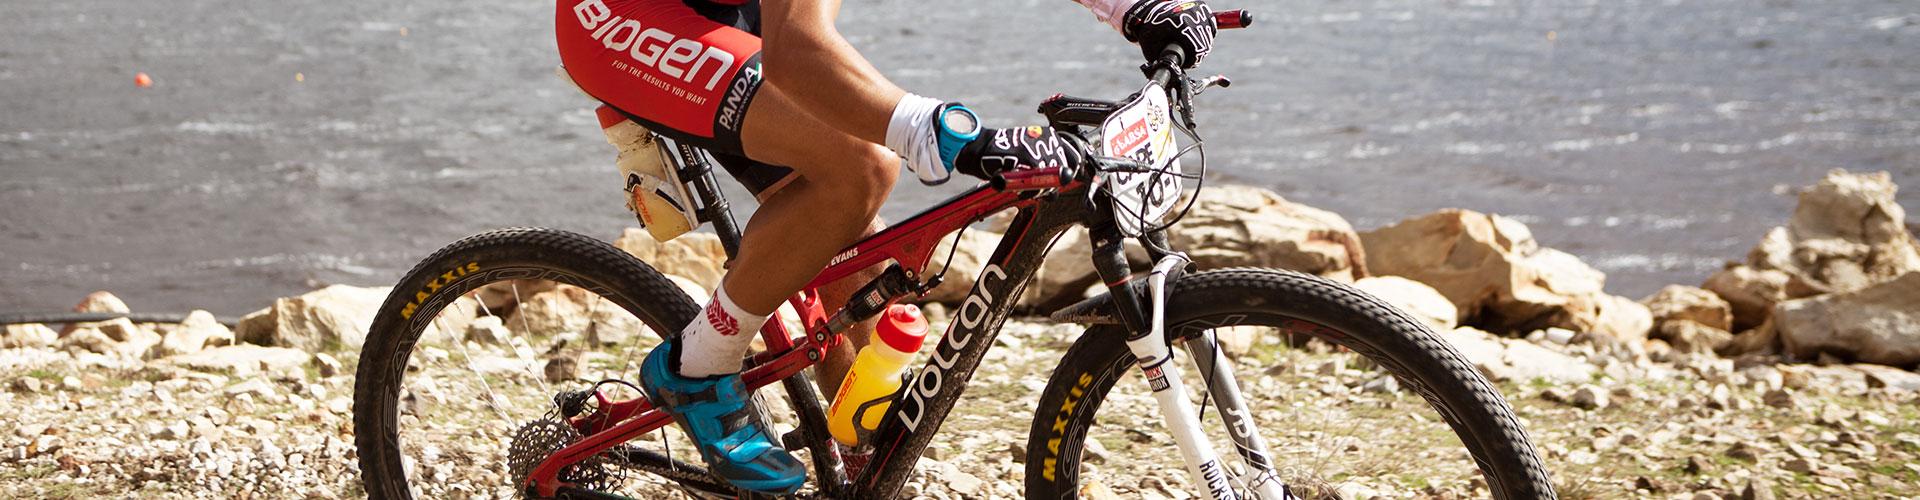 Volcan professional mountain bikes - Tephra HT